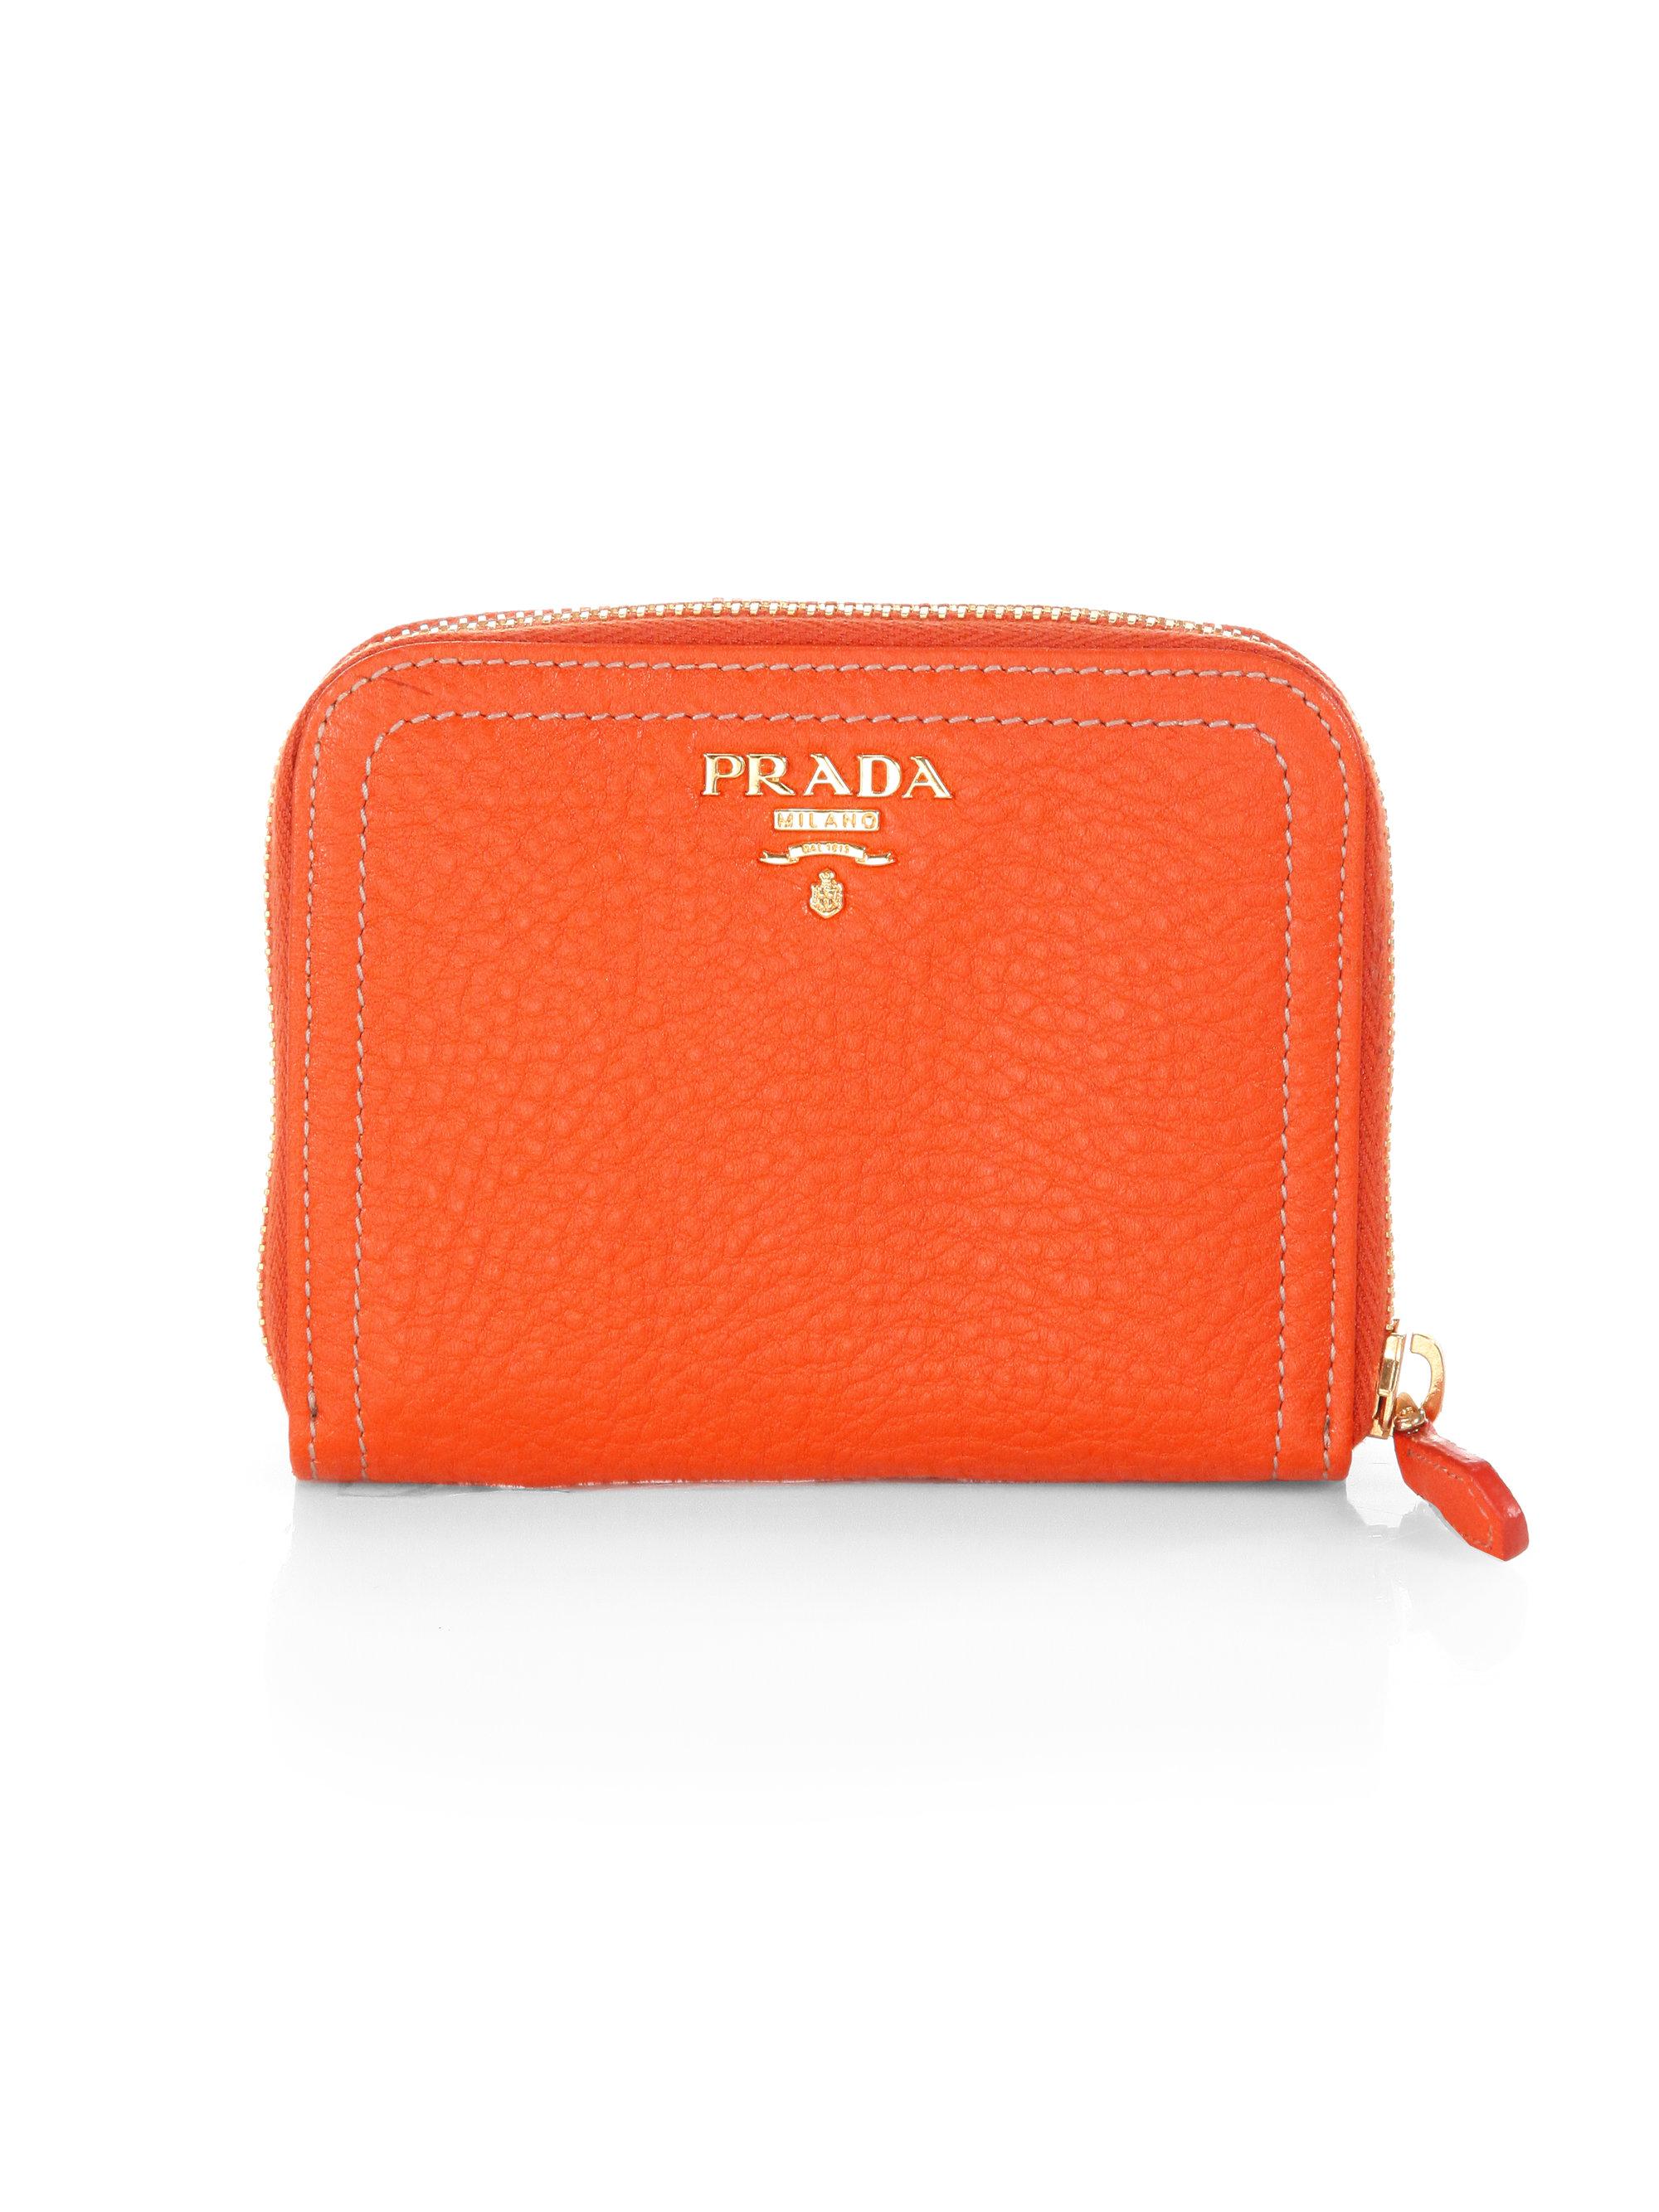 Prada Daino Small Zip Around Leather Wallet in Orange (PAPAYA) | Lyst